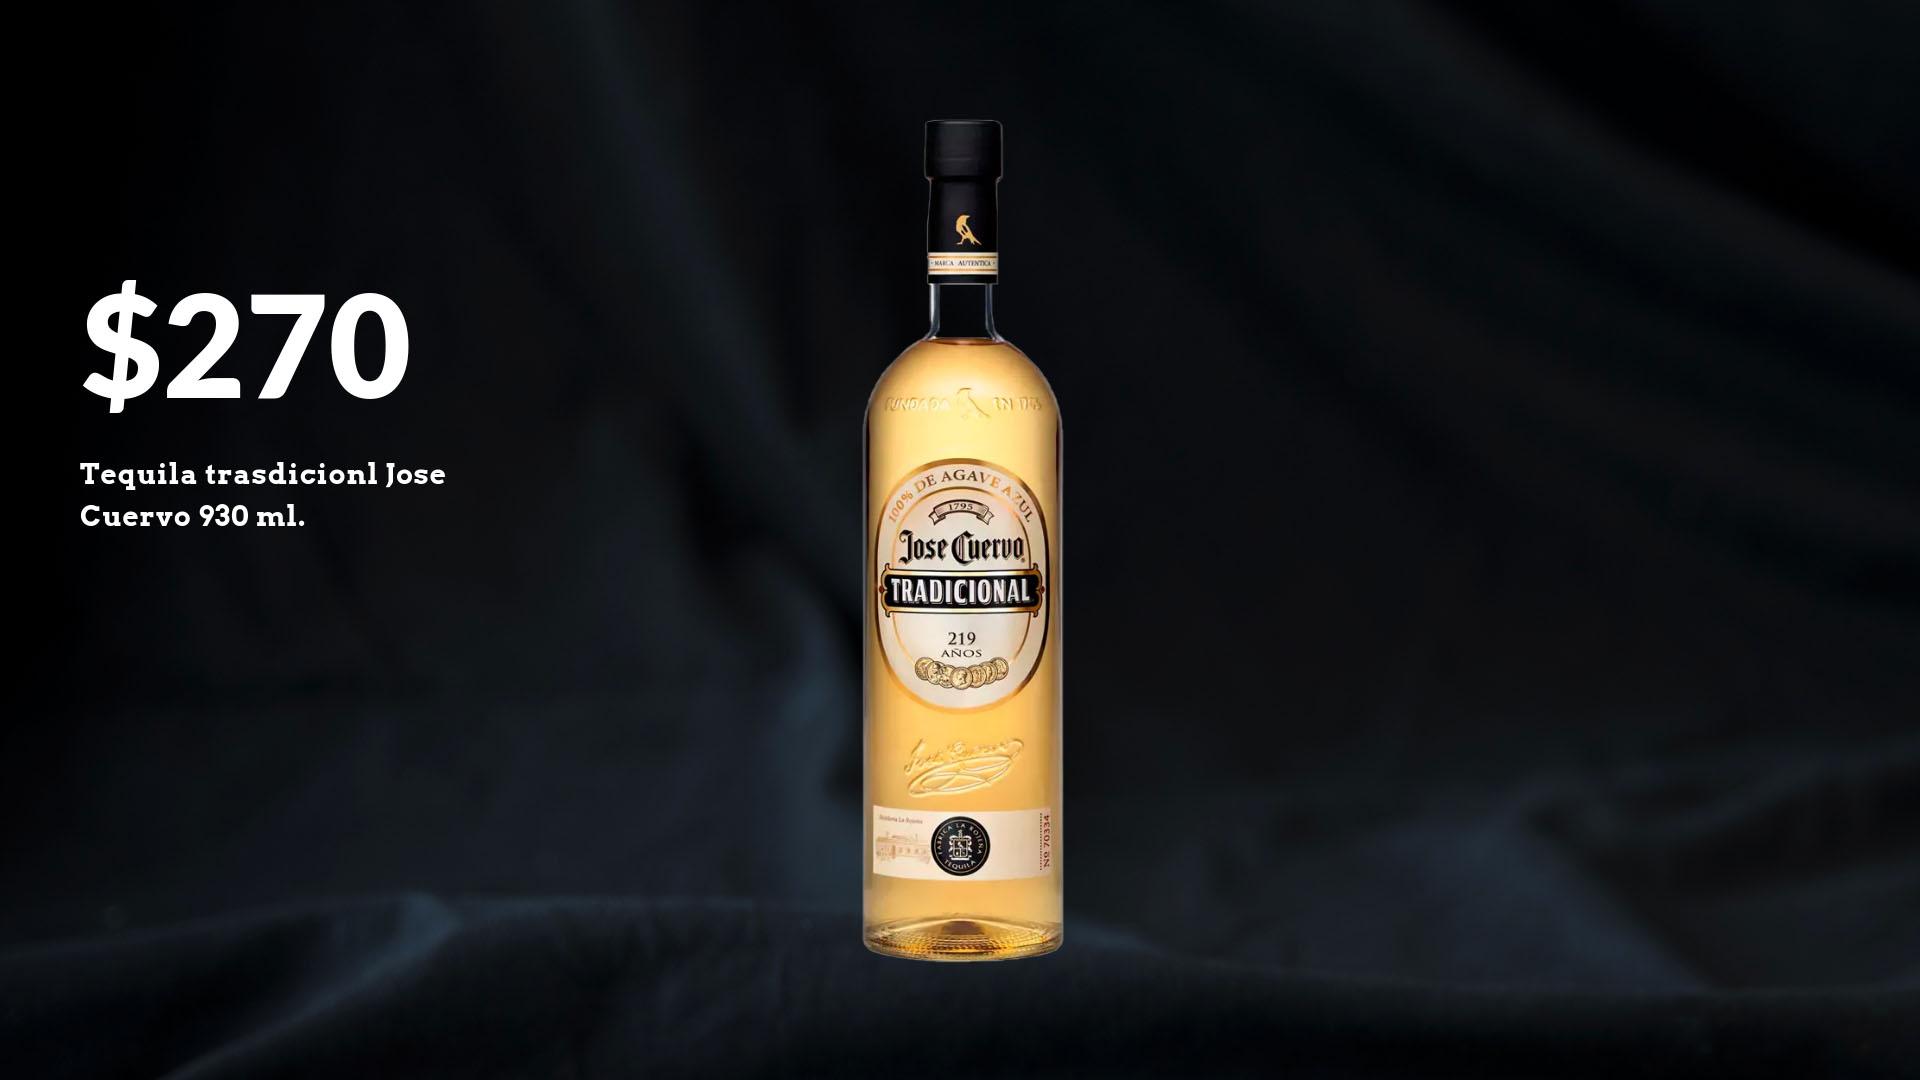 Tequila Jose Cuervo Tradicional $930 ml.